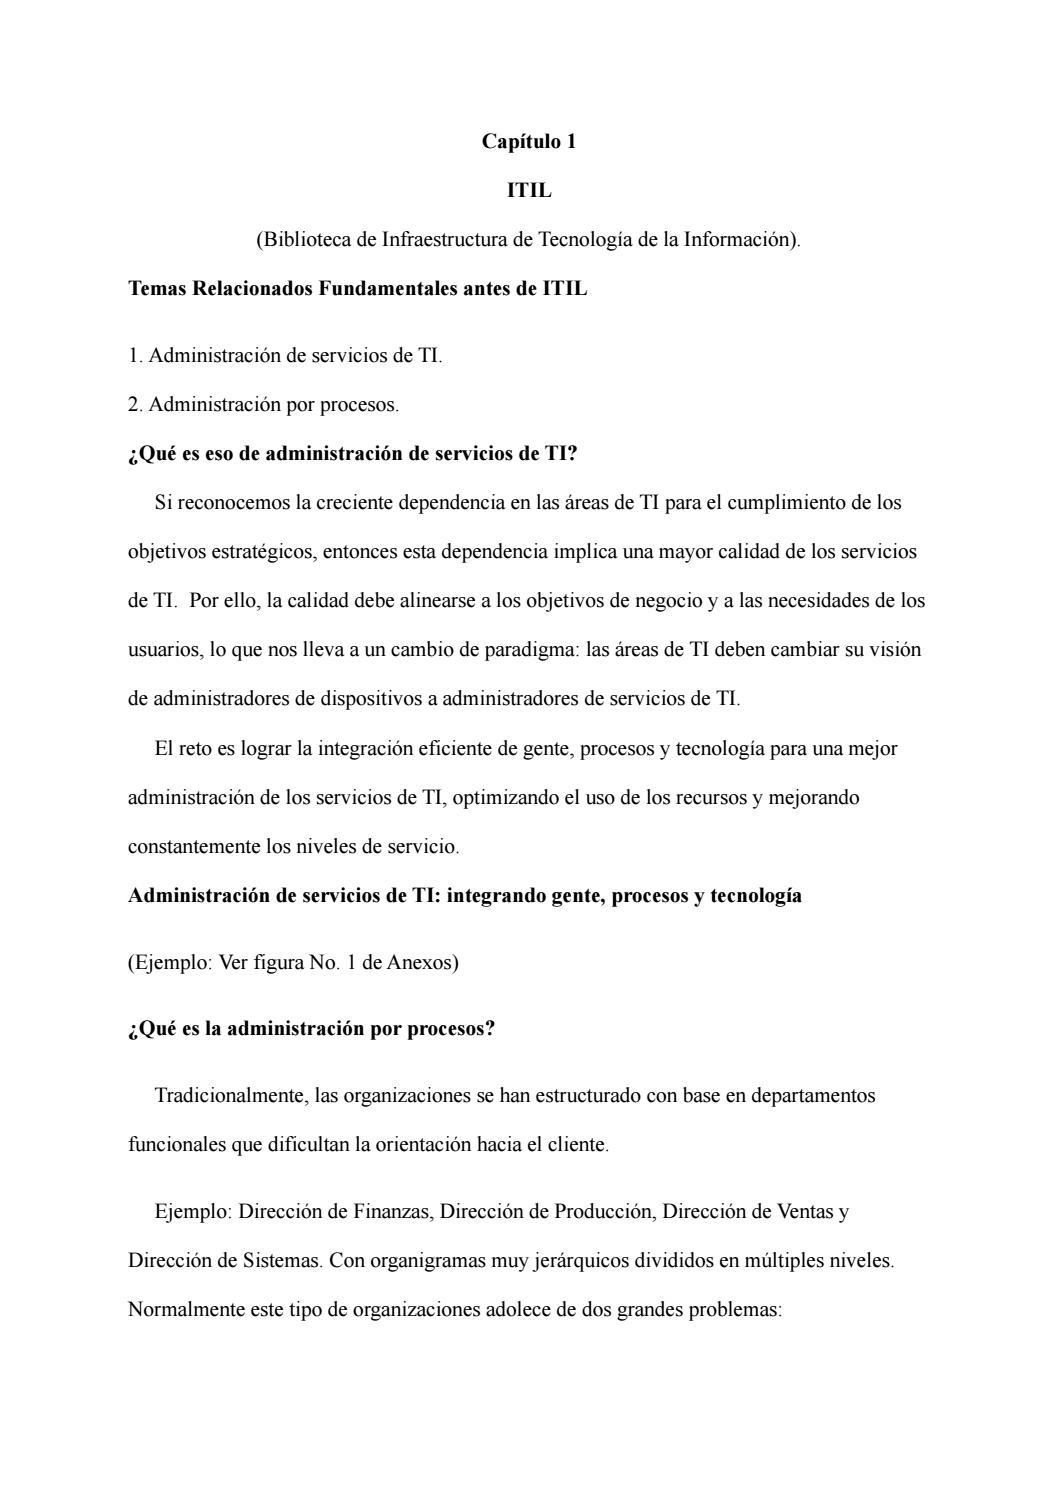 Resumen ejecutivo itil by Andrea Alvarado - issuu